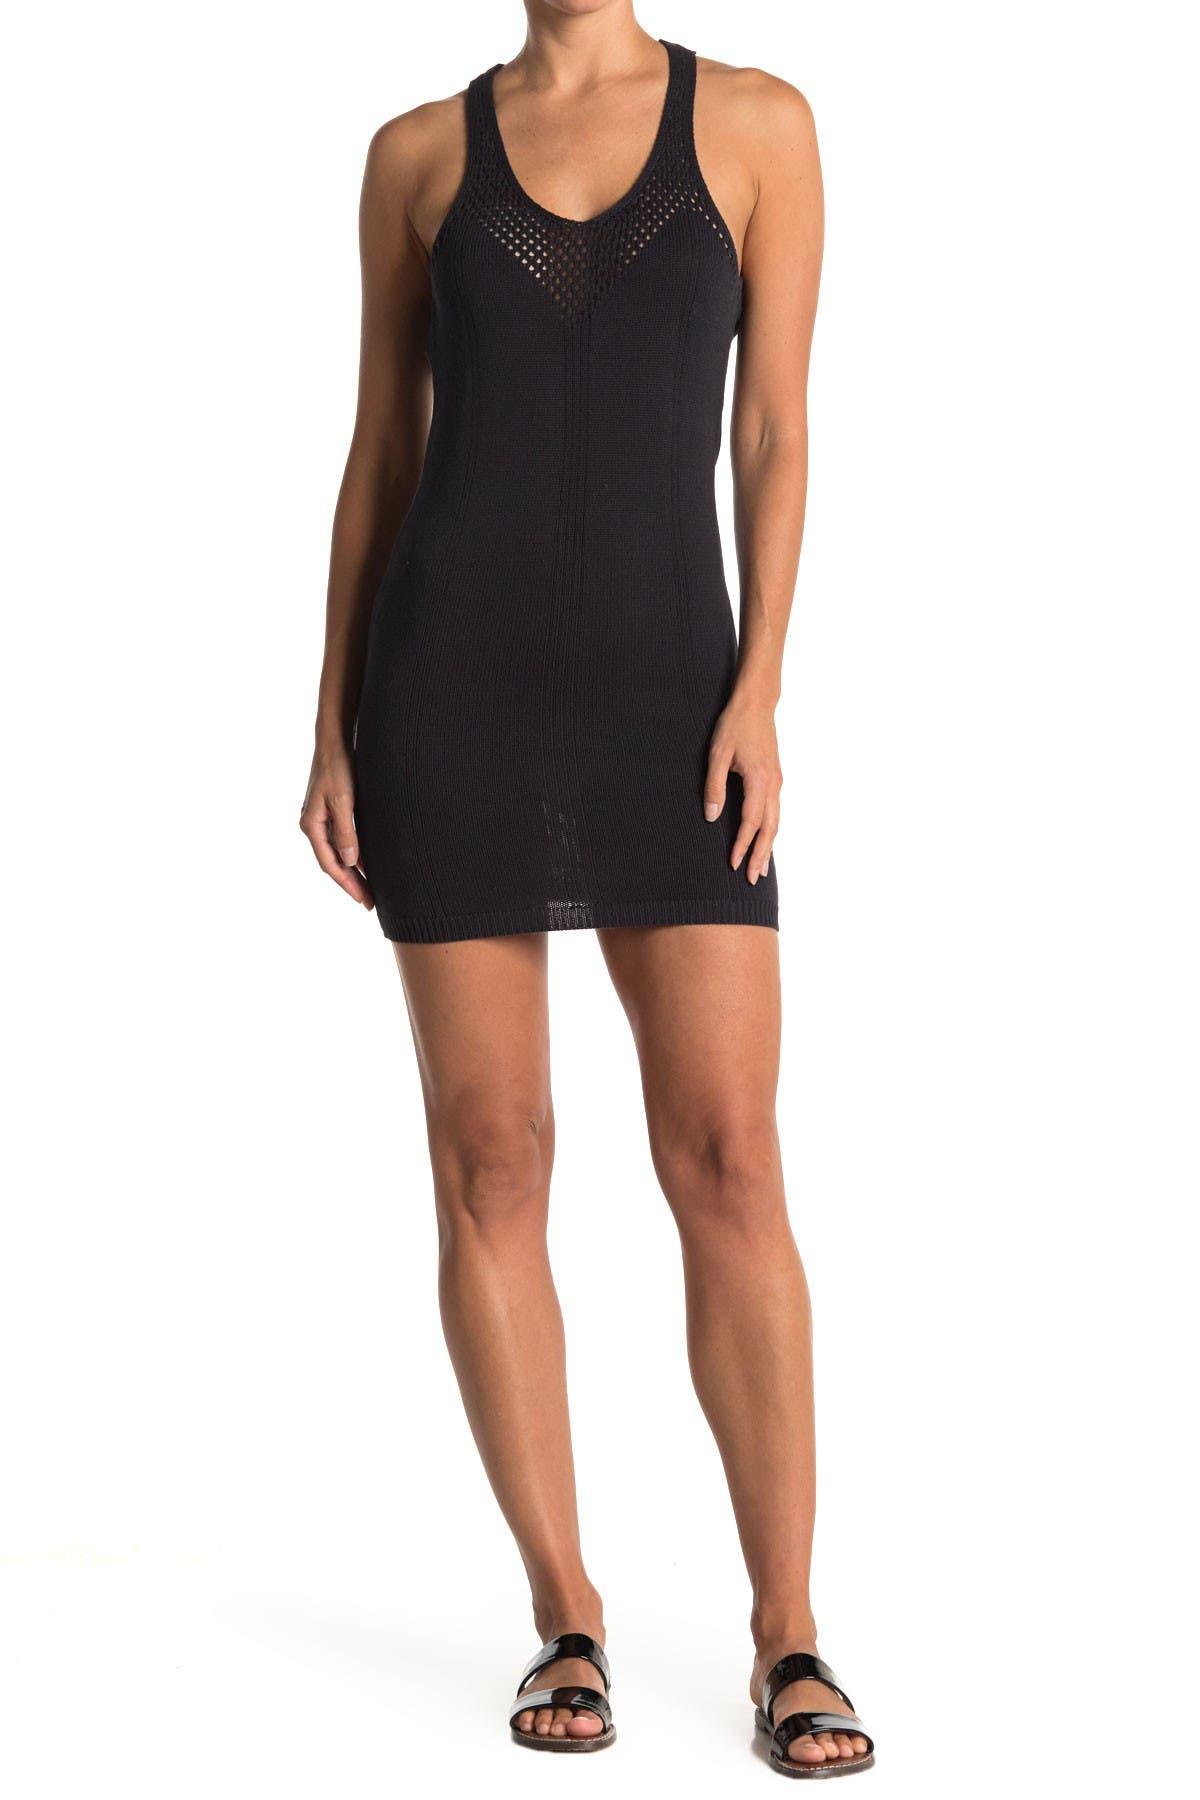 Image of Free People Knockout Swit Slip Mini Dress